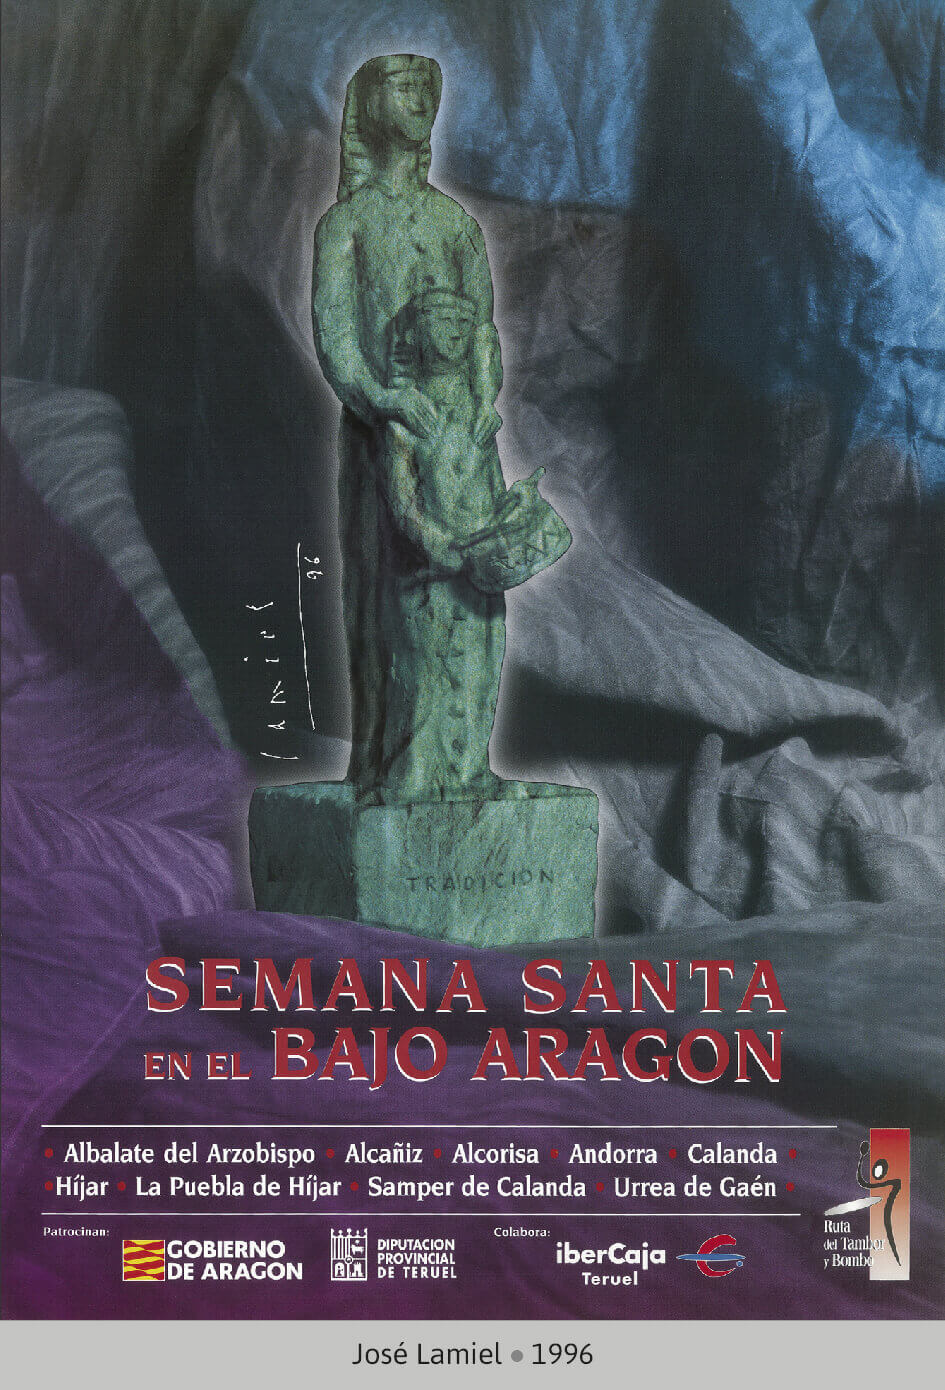 Cartel Ganador Ruta del Tambor y Bombo. Semana Santa 1996